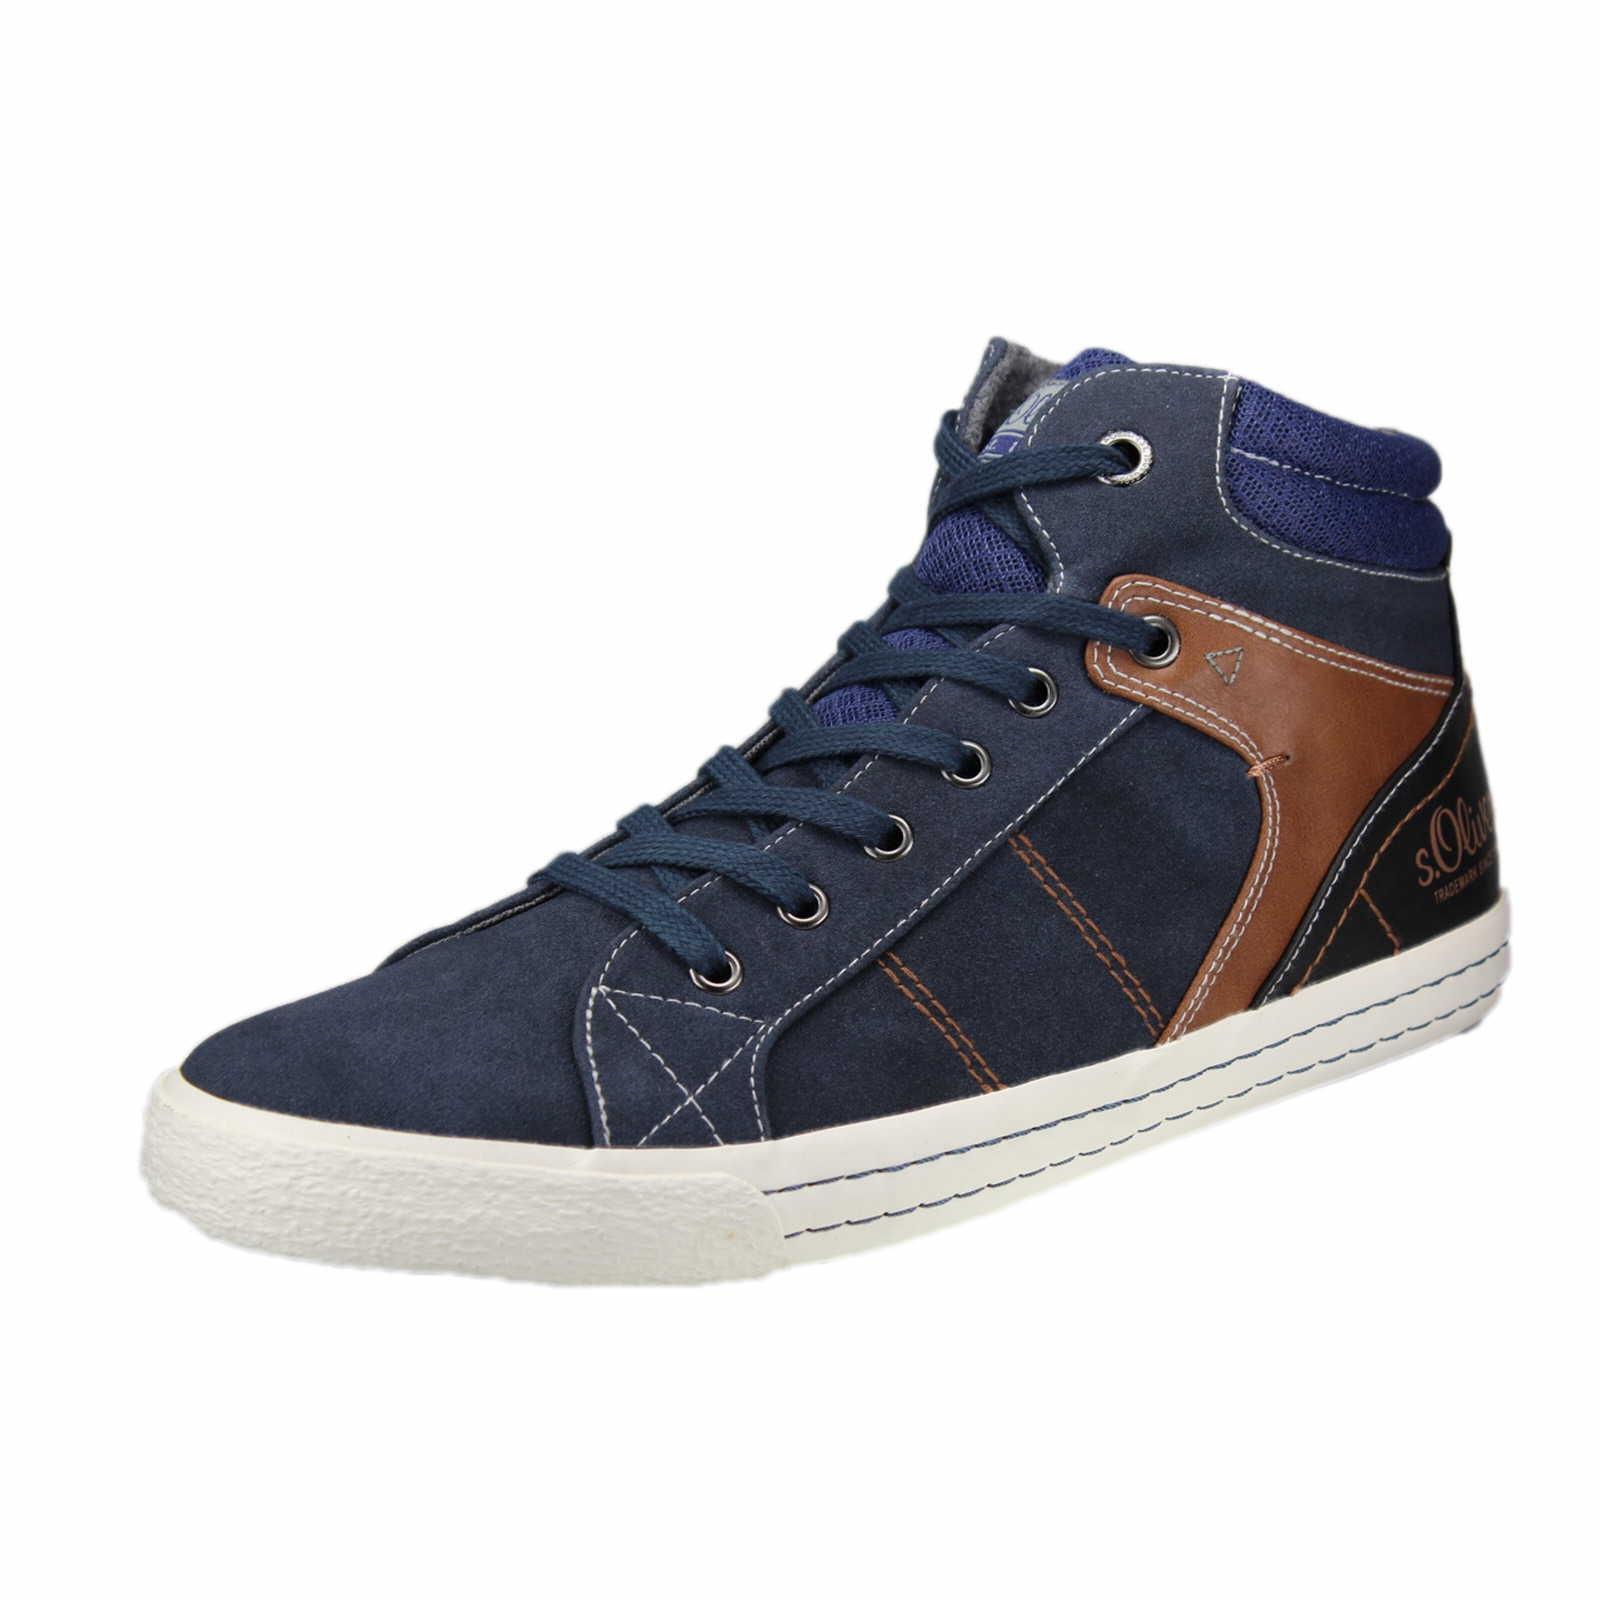 s oliver sneaker f r herren in blau schuhparadies. Black Bedroom Furniture Sets. Home Design Ideas